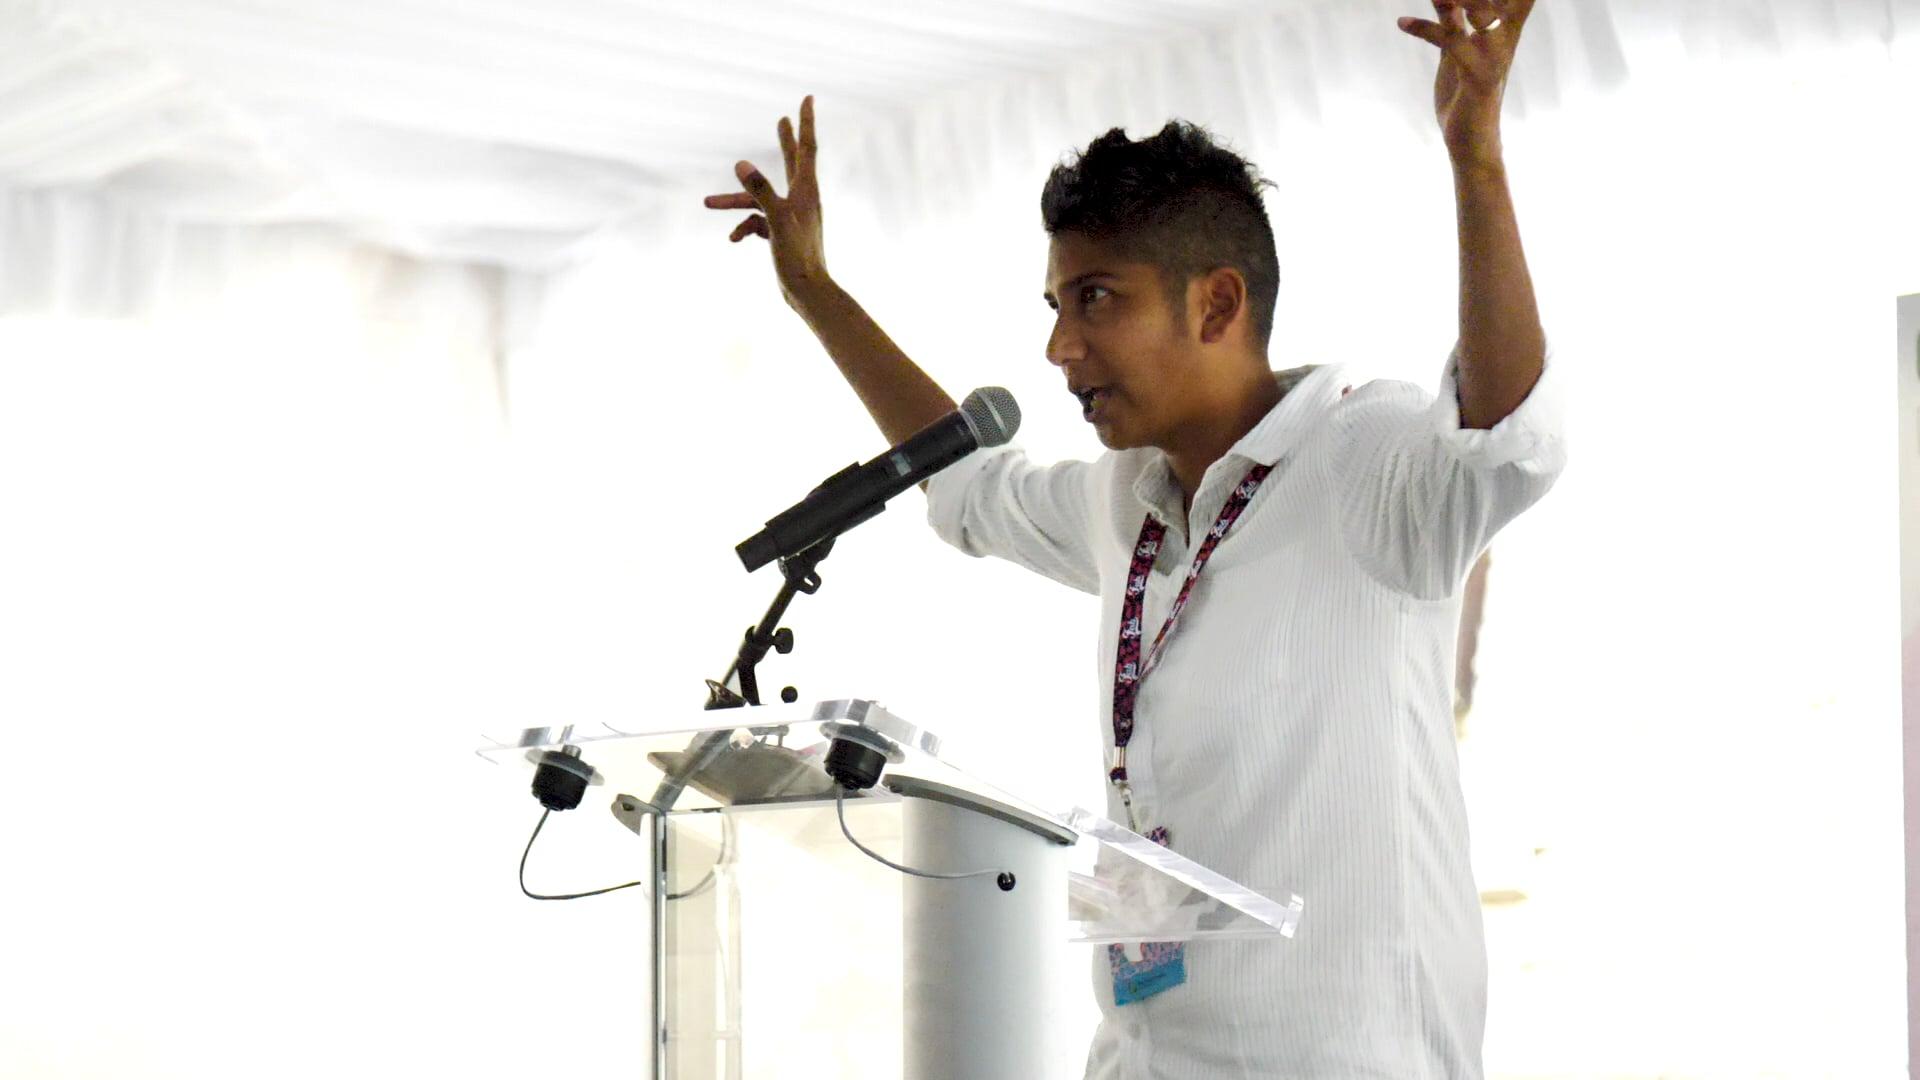 FAB 2019 Keynote Speaker - Chef Preeti Mistry